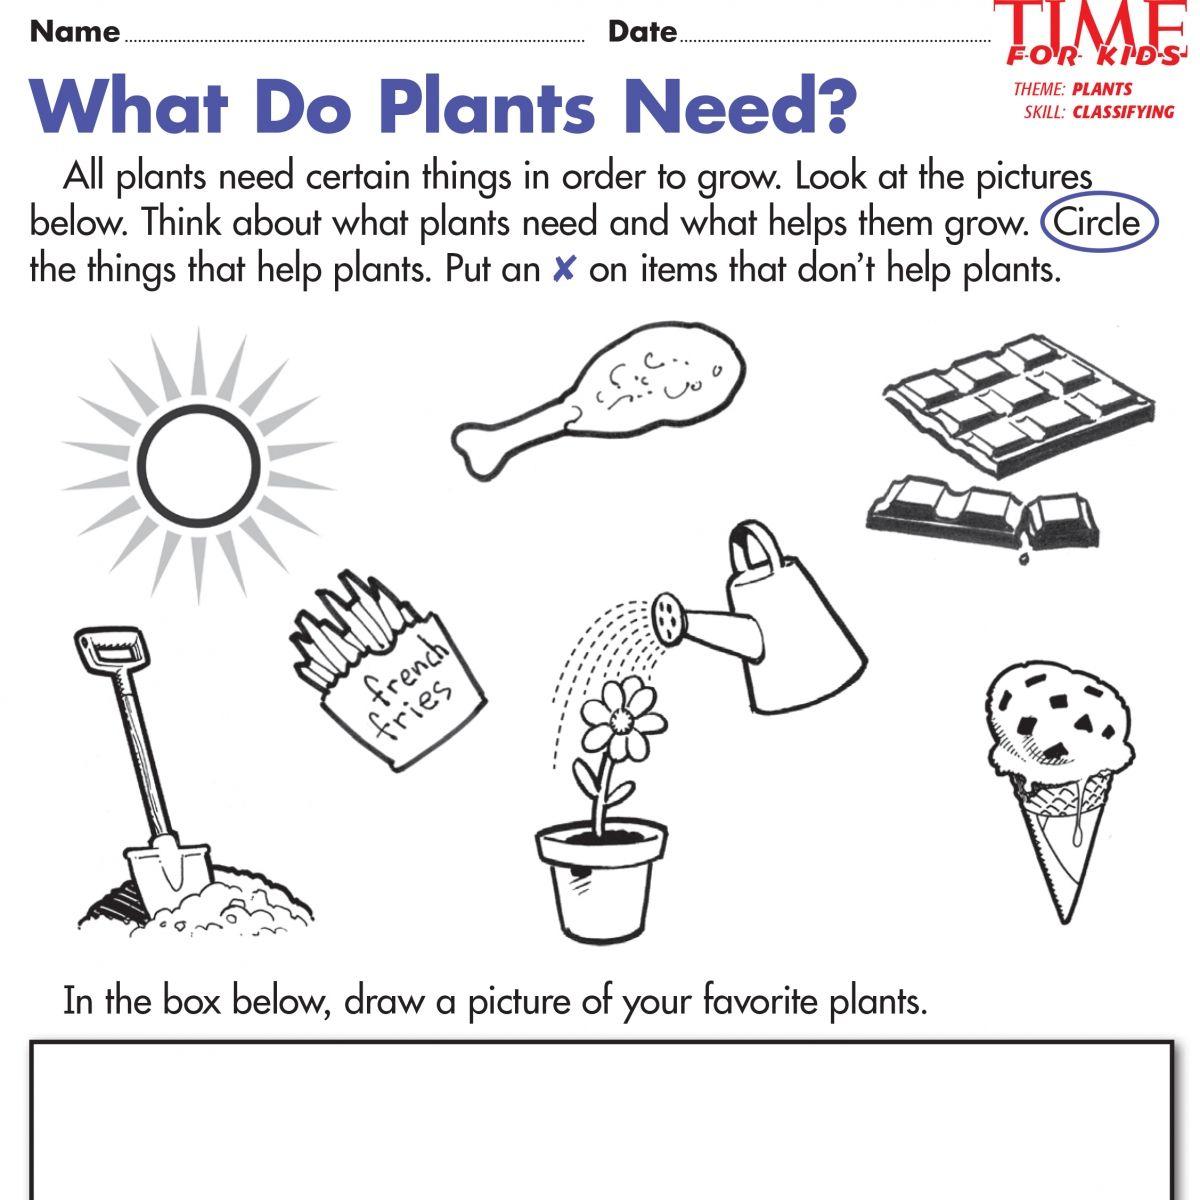 medium resolution of plant worksheets for kindergarten - Google Search   Kindergarten worksheets